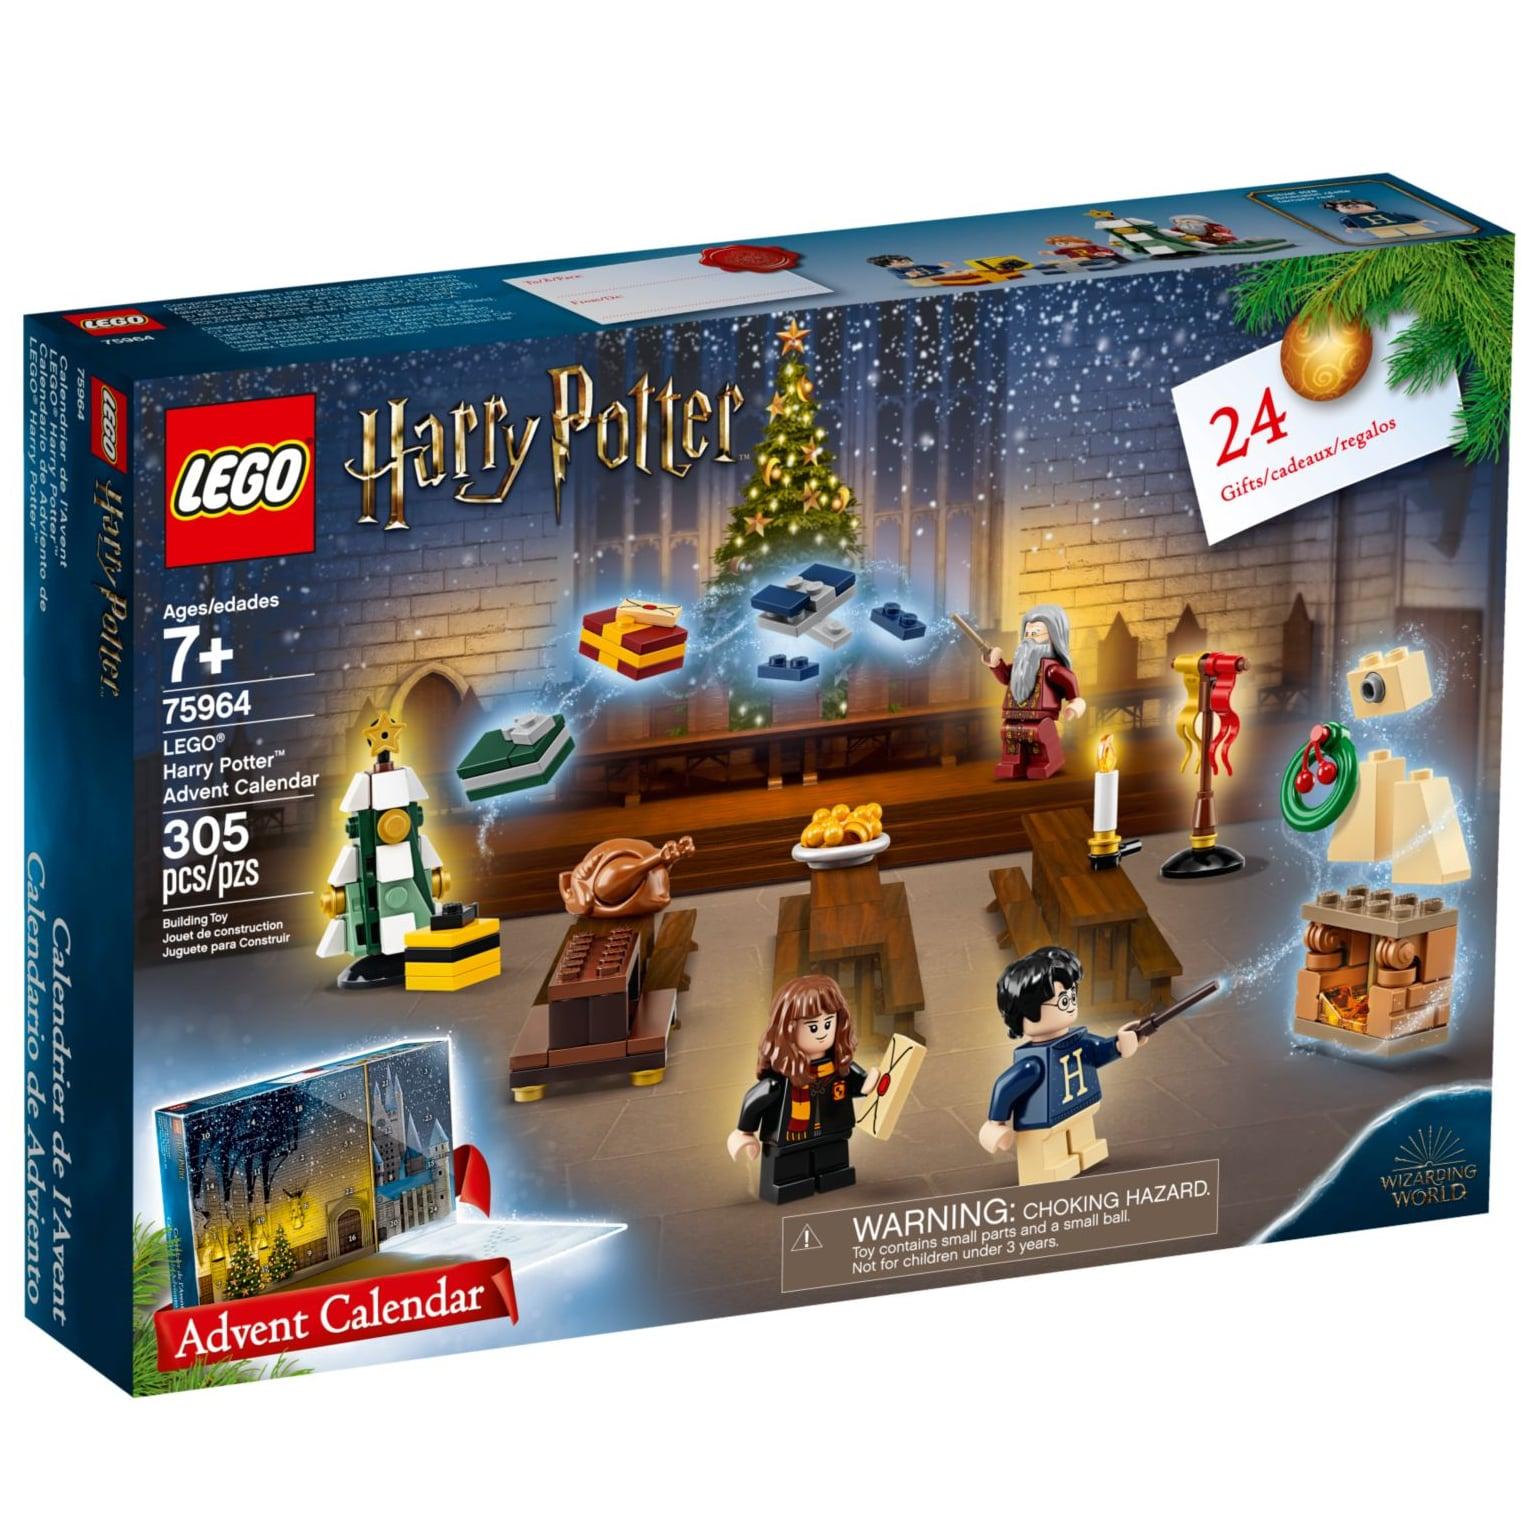 Lego Harry Potter and Star Wars Advent Calendars 2019 | POPSUGAR ...